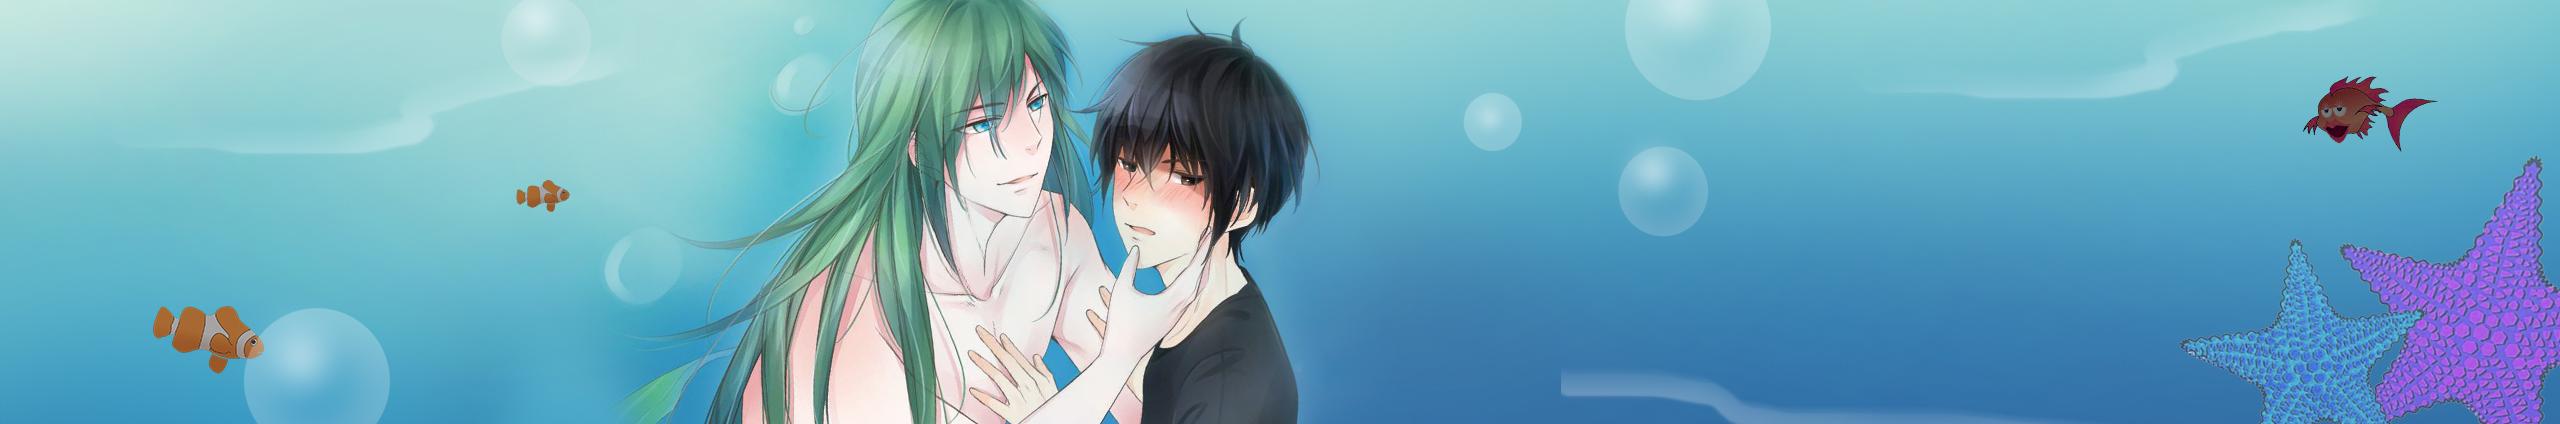 A Merman รักนี้สีน้ำทะเล